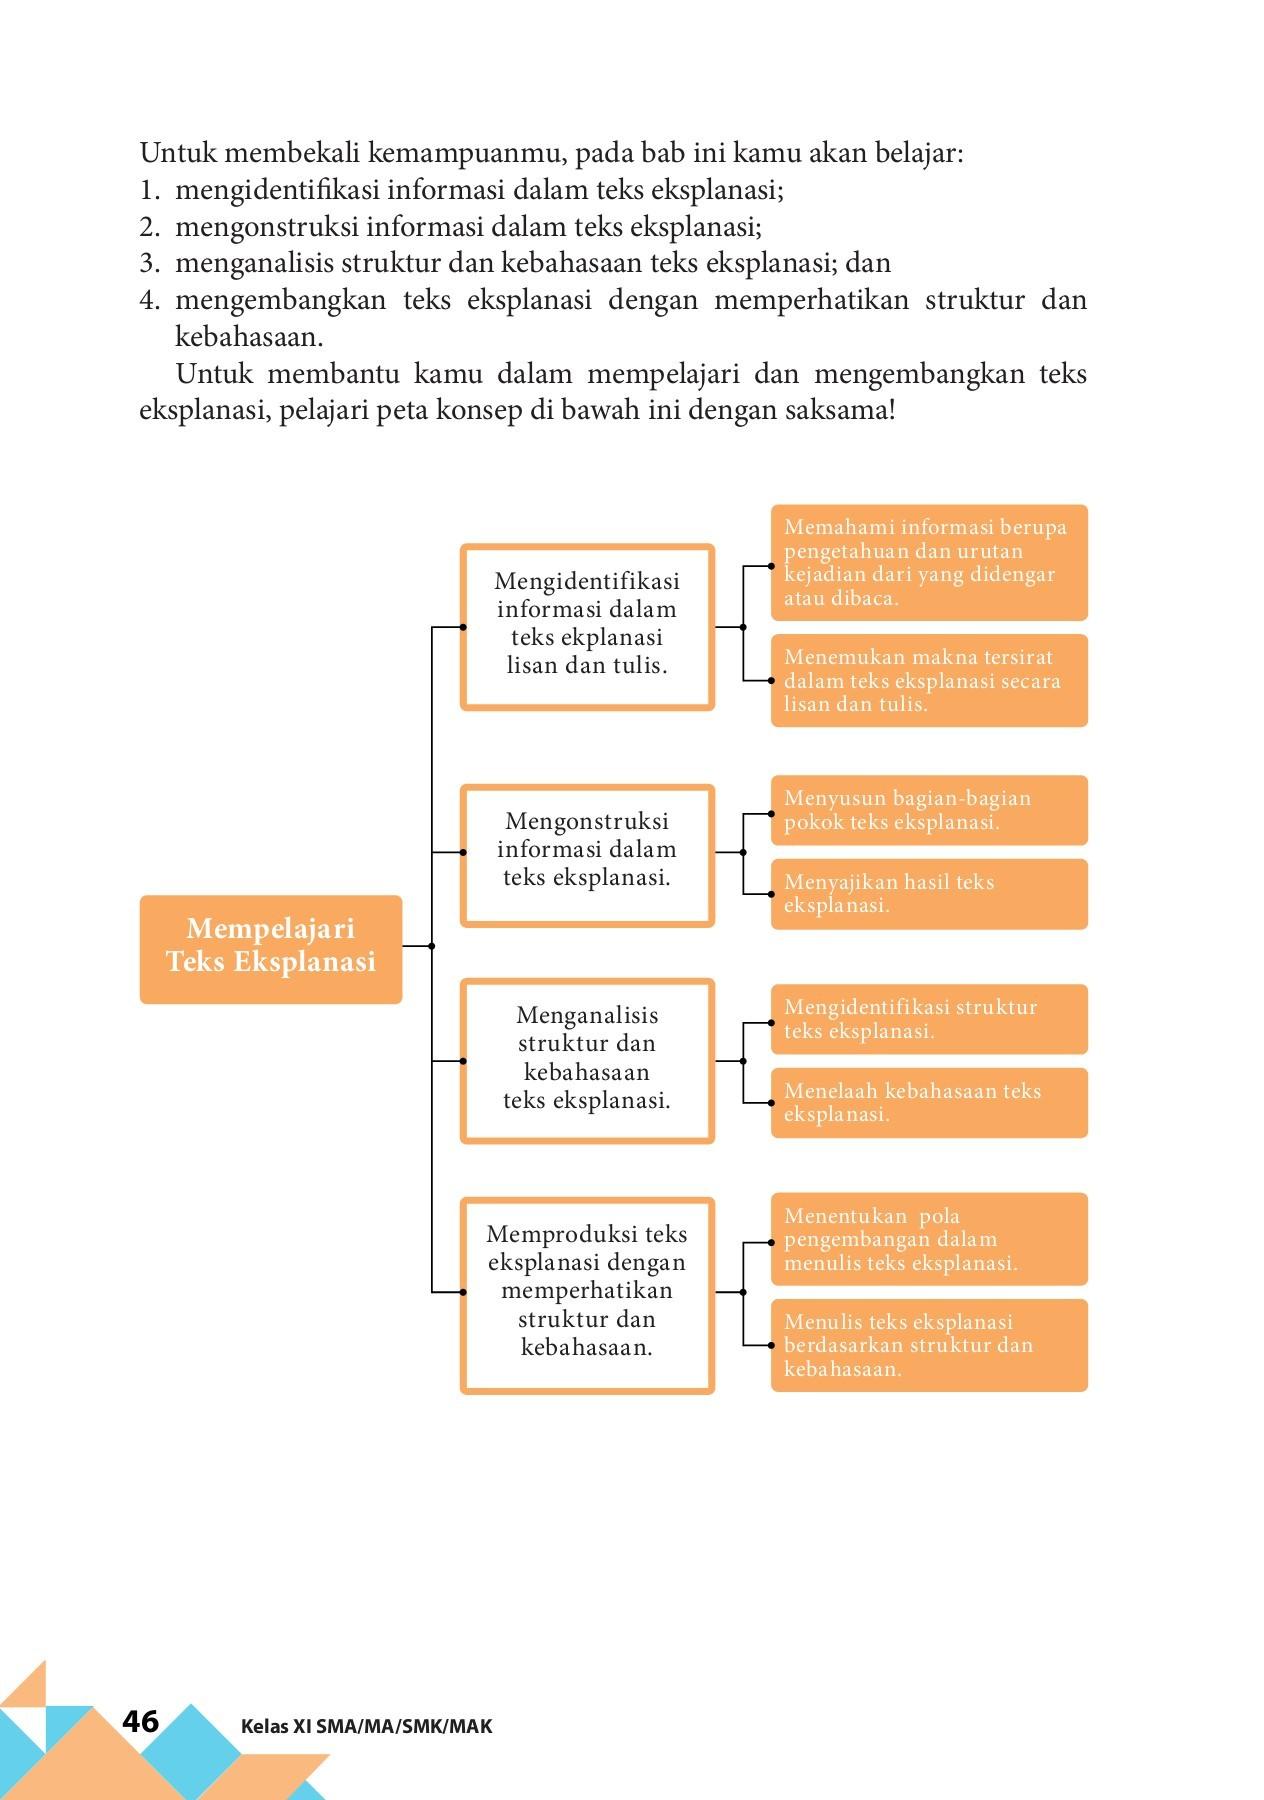 Langkah Pertama Dalam Menyusun Teks Eksplanasi : langkah, pertama, dalam, menyusun, eksplanasi, Bahasa, Indonesia, Kelas, 11_by, Sartono, Pages, 51-100, PubHTML5